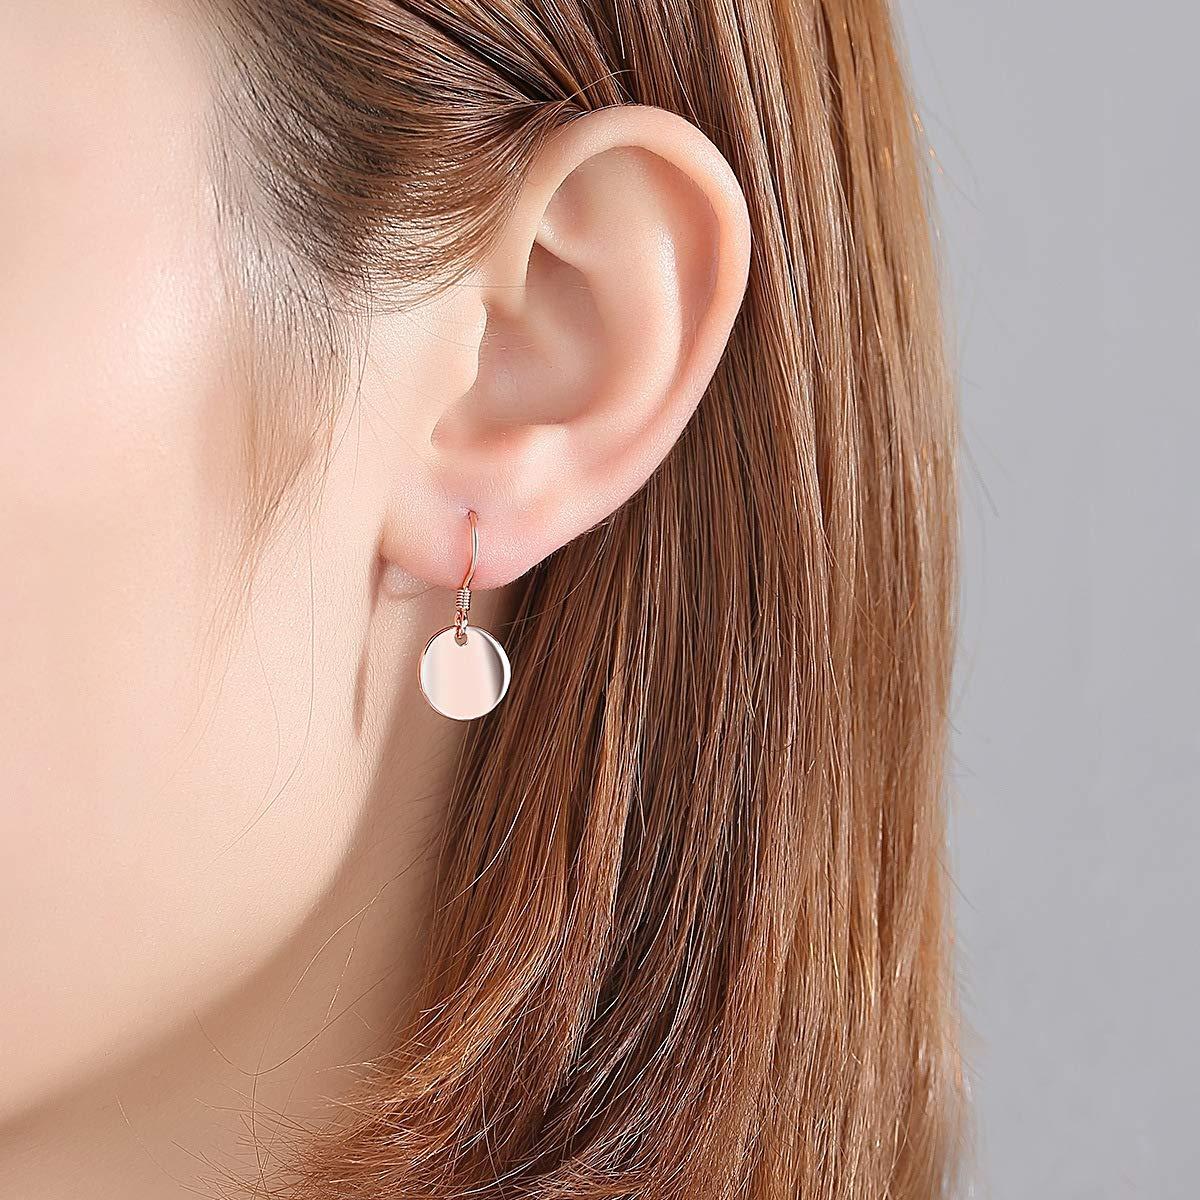 Kalapure 14K Rose Gold 925 Sterling Silver Shiny Earrings Small Circle Disc Dangle Drop Earrings for Women Girls